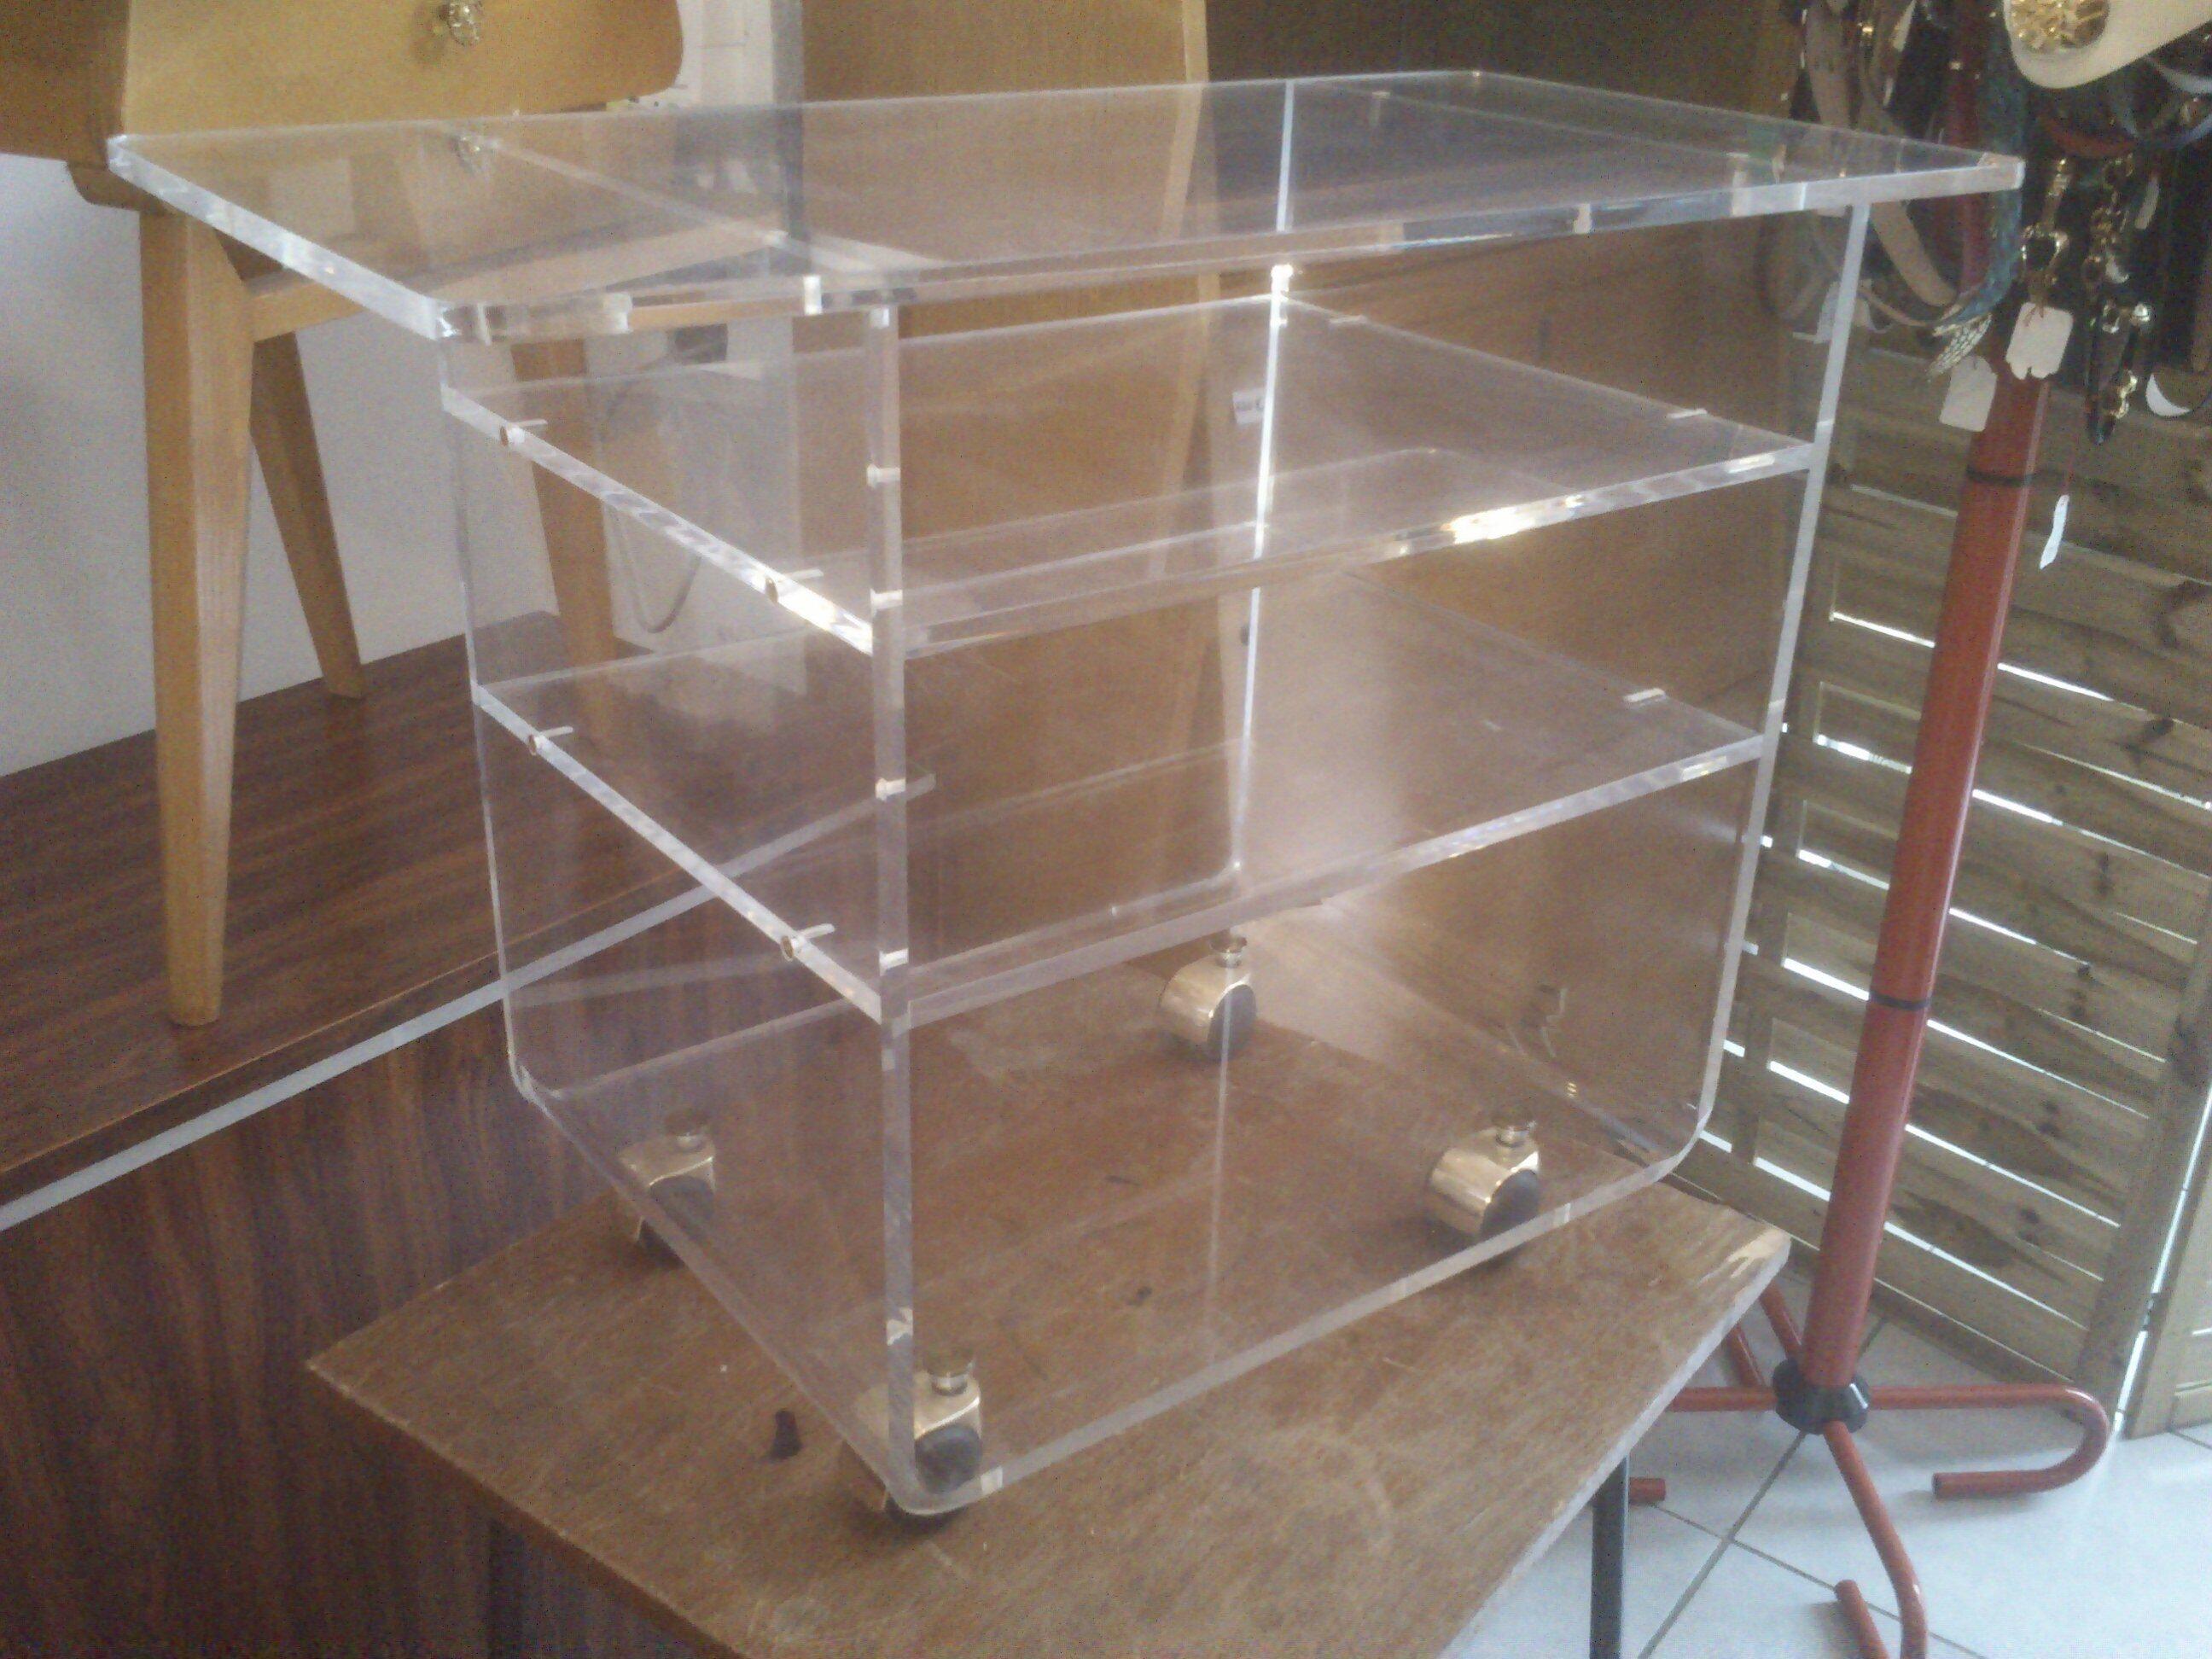 Meuble Plexiglas Transparent Awesome Made In Meubles Fauteuil  # Meuble Tv Sur Roulettes First Plexiglass